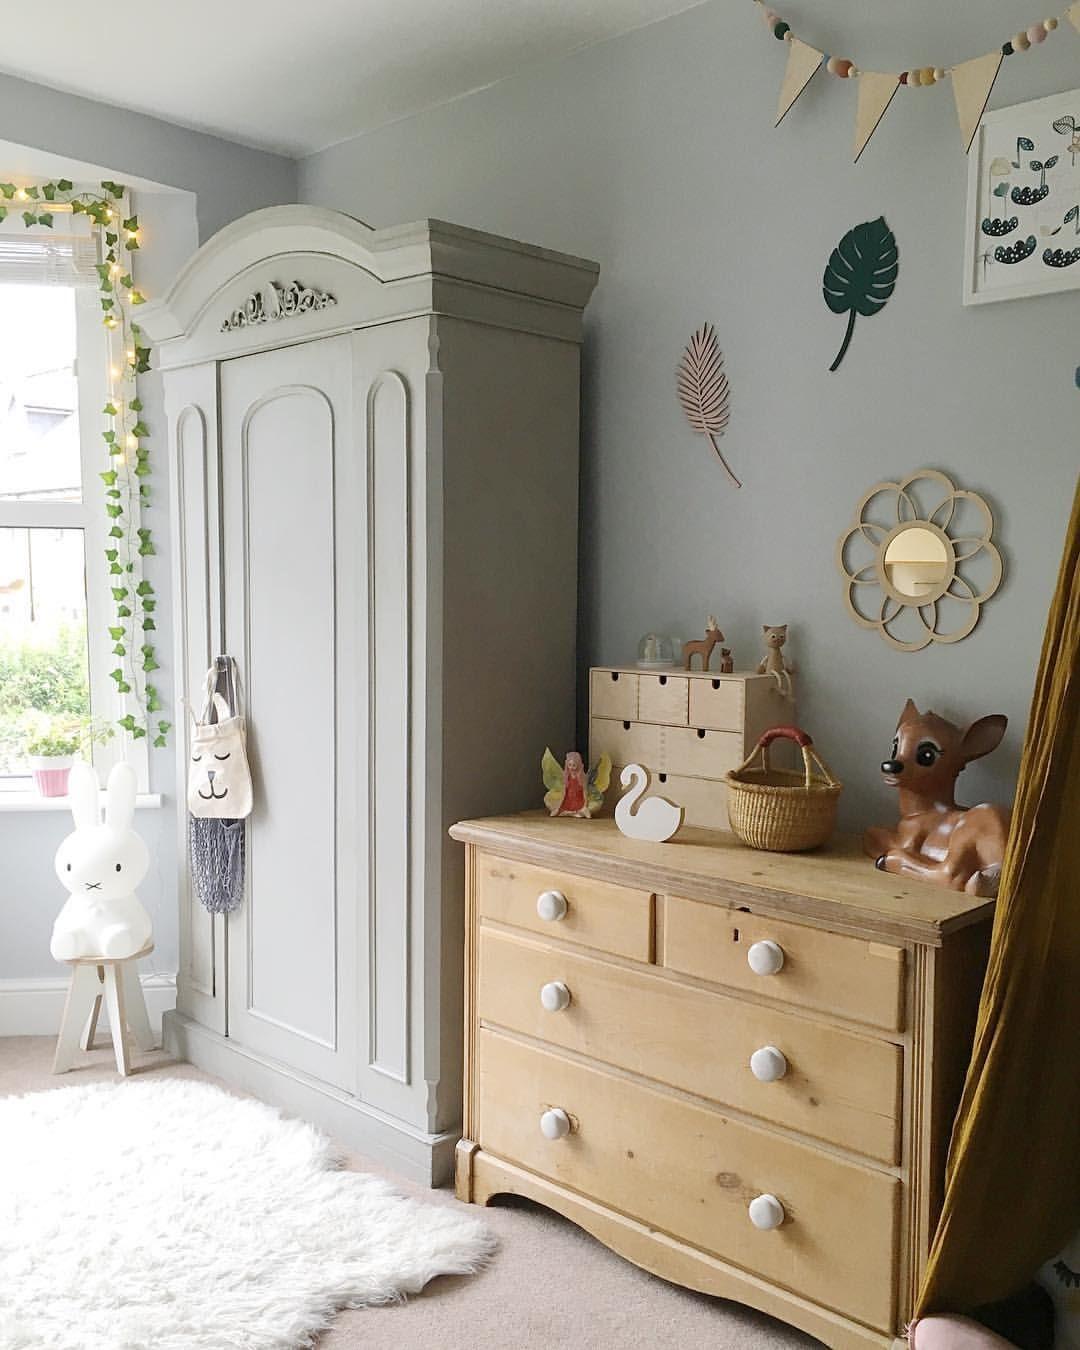 Gray Vintage Room: Vintage Inspired Girls Grey Bedroom With Botanical Style